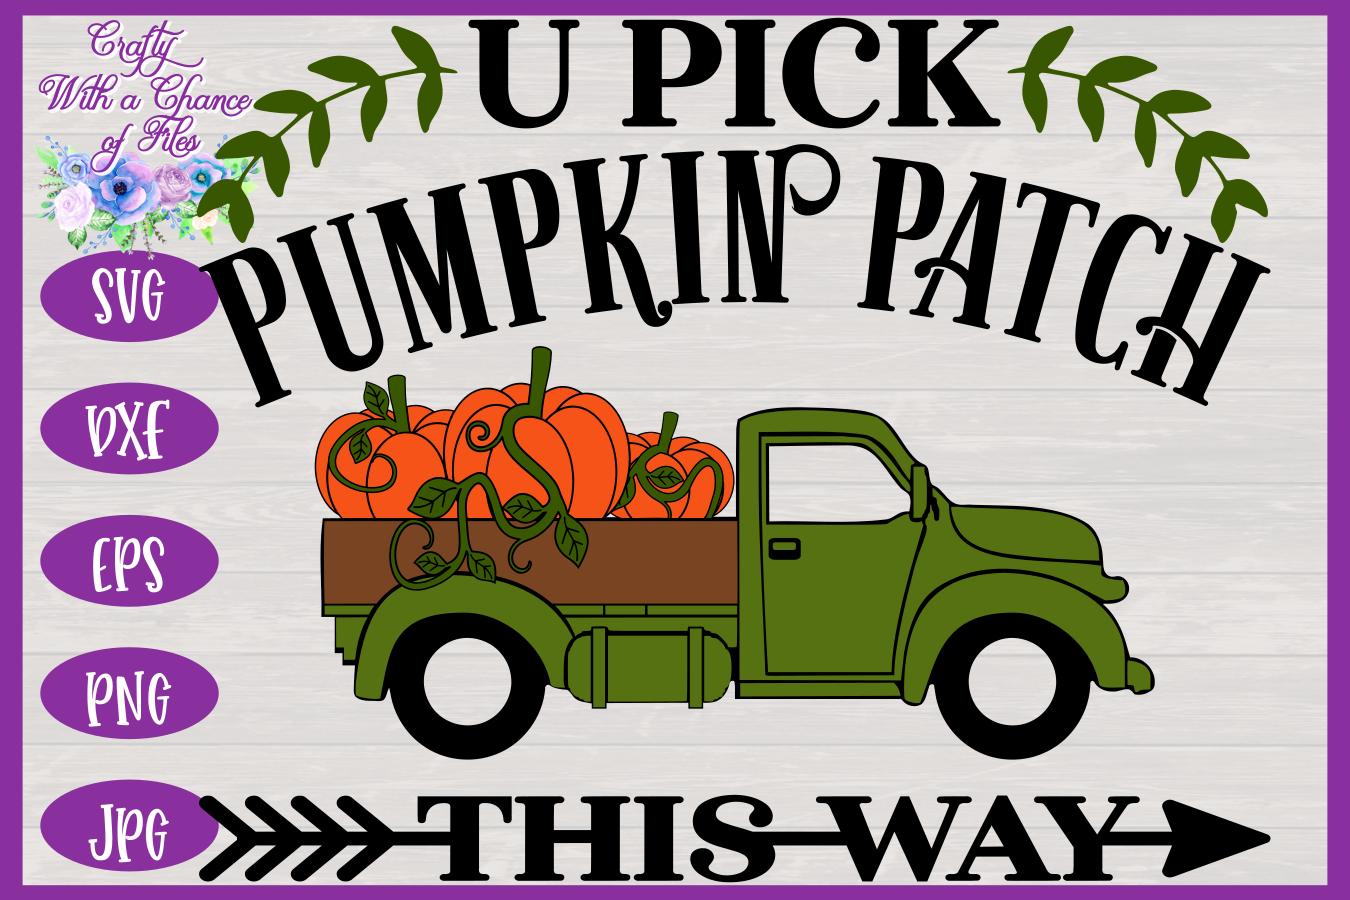 U Pick Pumpkins SVG | Fall Truck SVG | Pumpkin Patch SVG example image 3